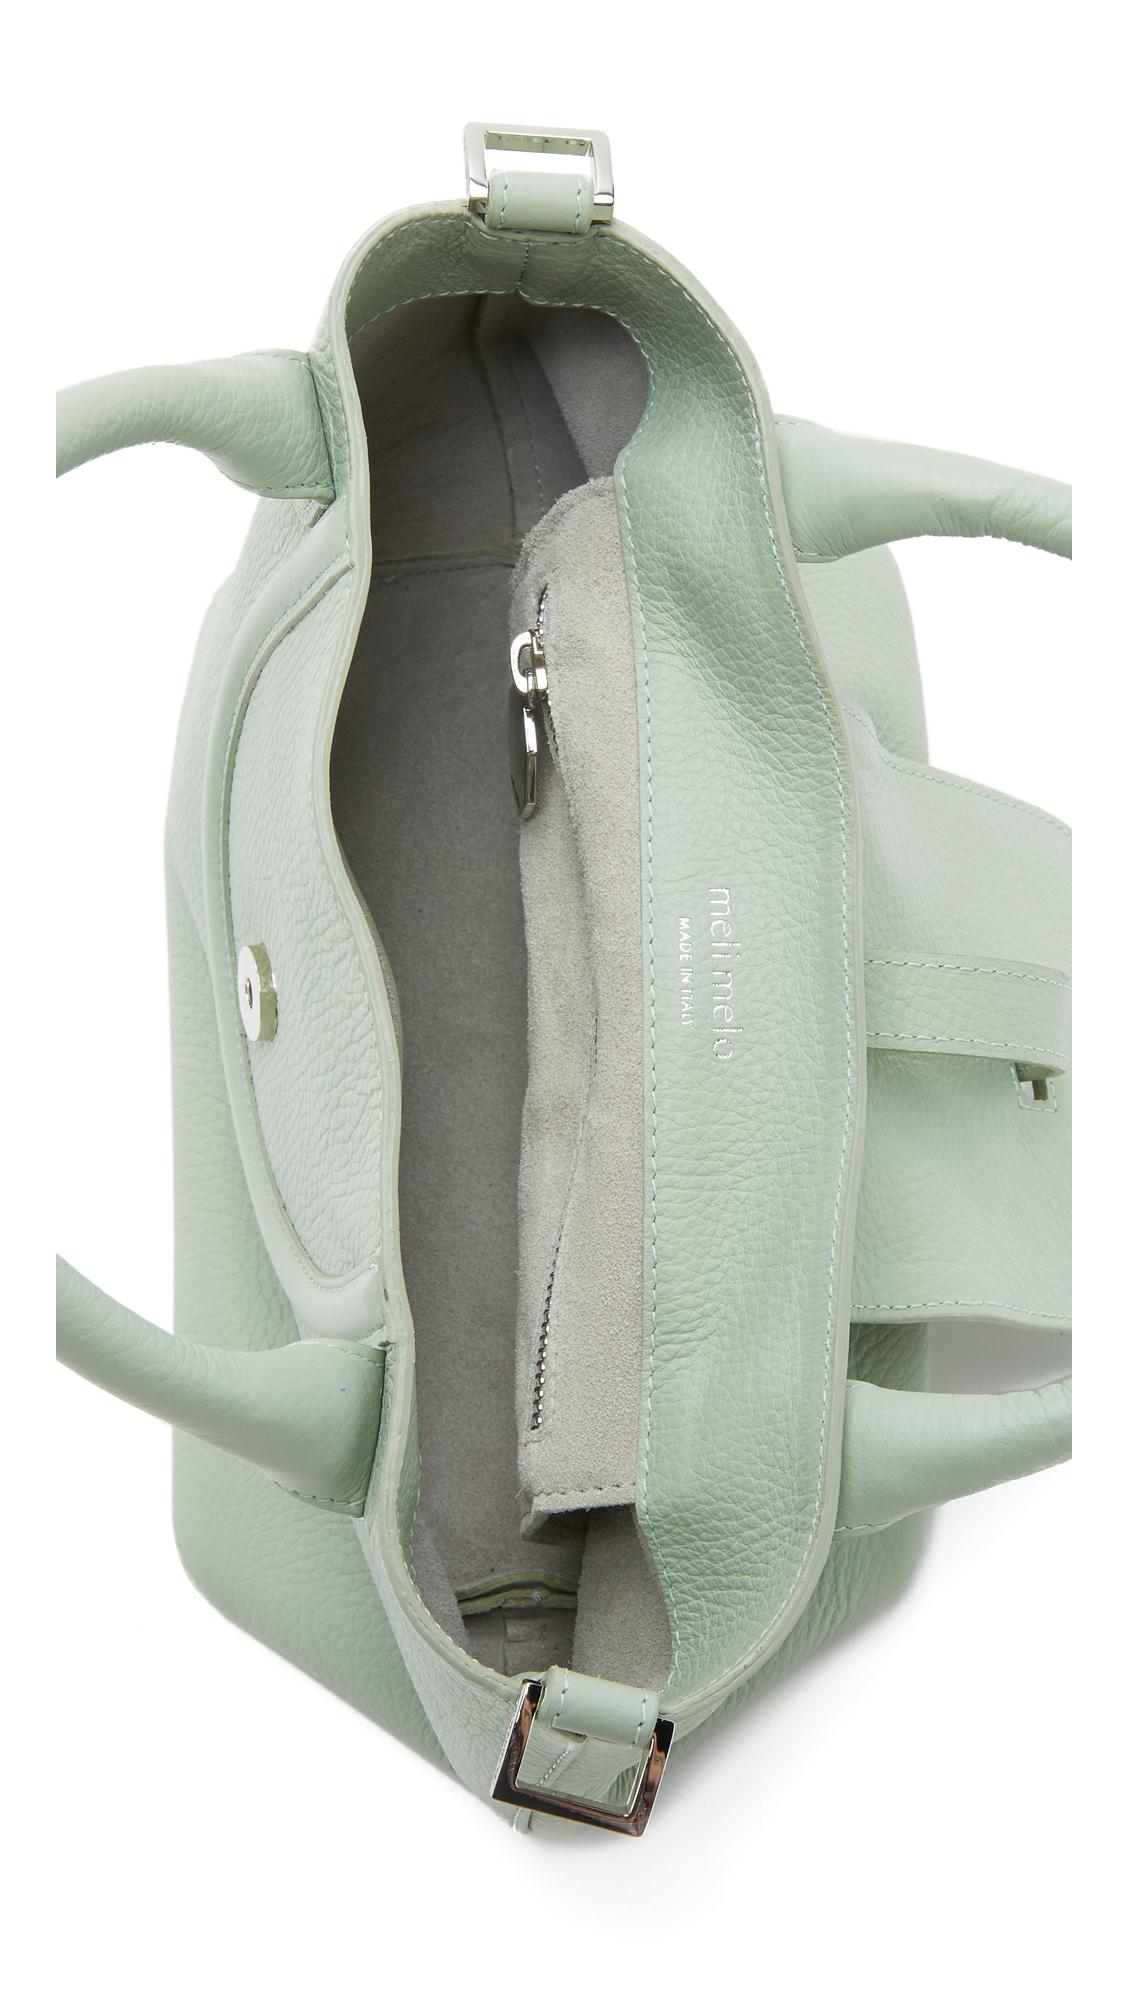 meli melo halo mini cross body bag in green lyst. Black Bedroom Furniture Sets. Home Design Ideas